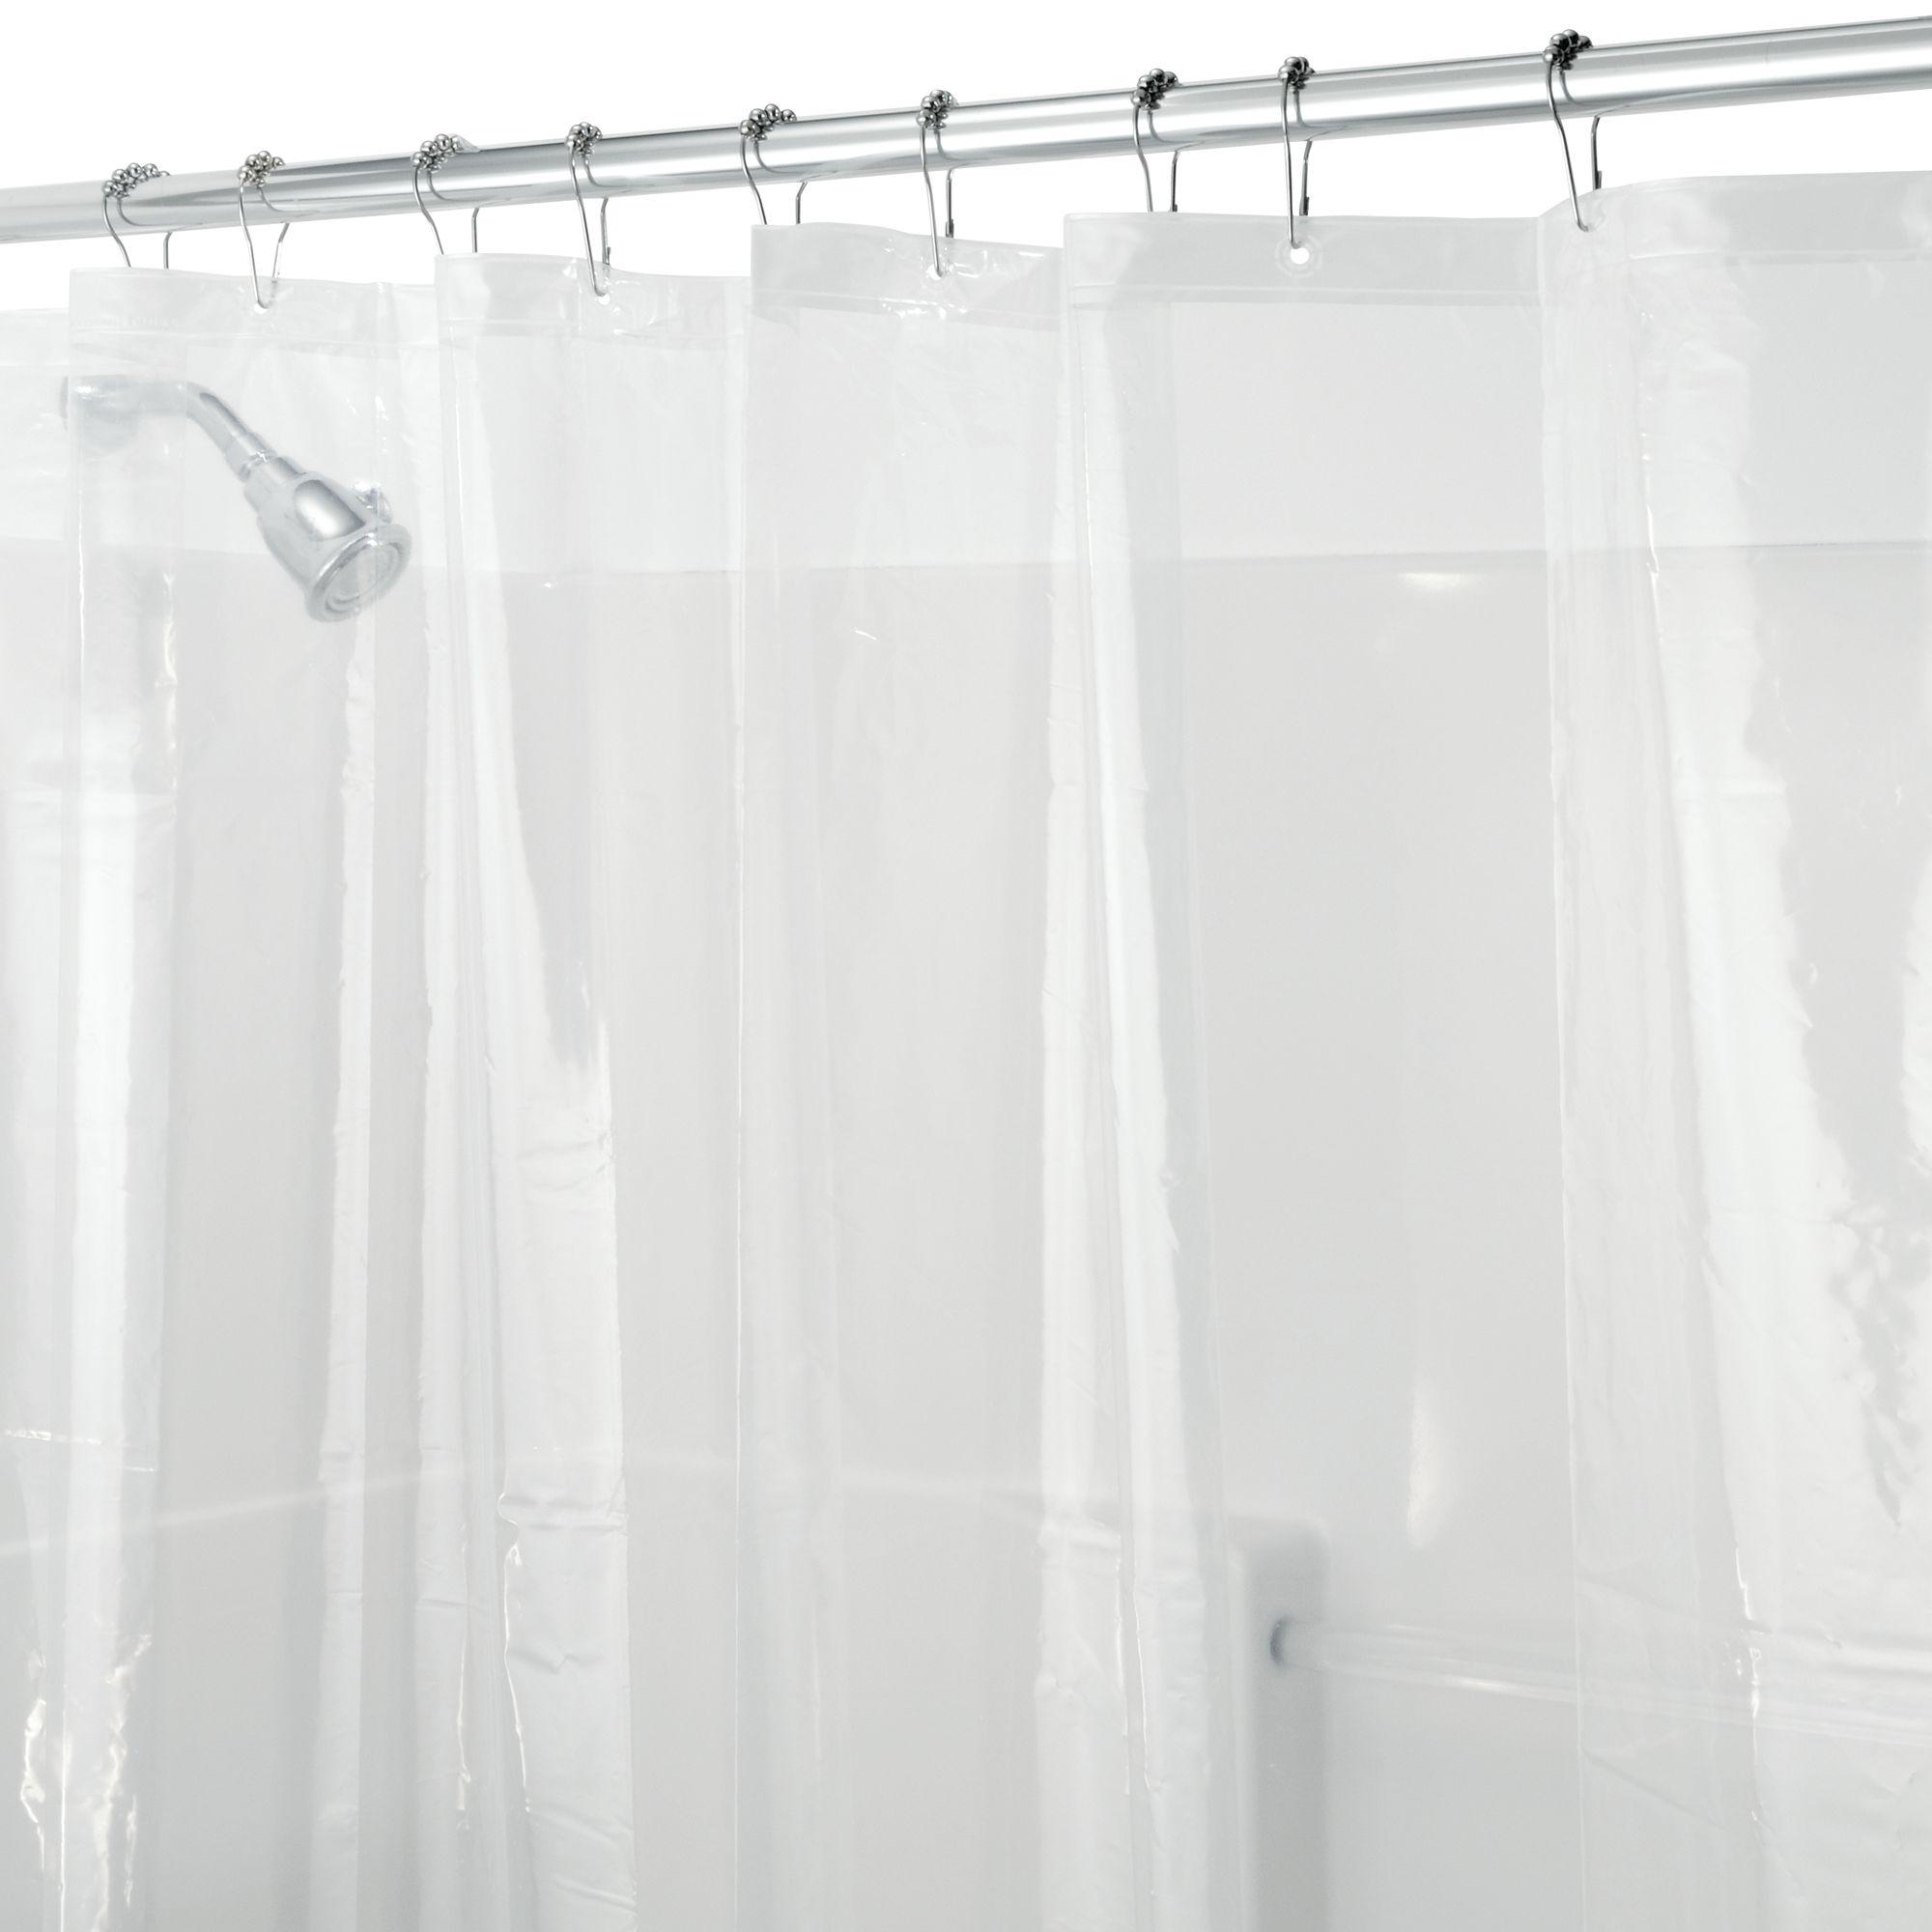 InterDesign PEVA 3 Gauge Shower Curtain Liner, Various Sizes & Colors